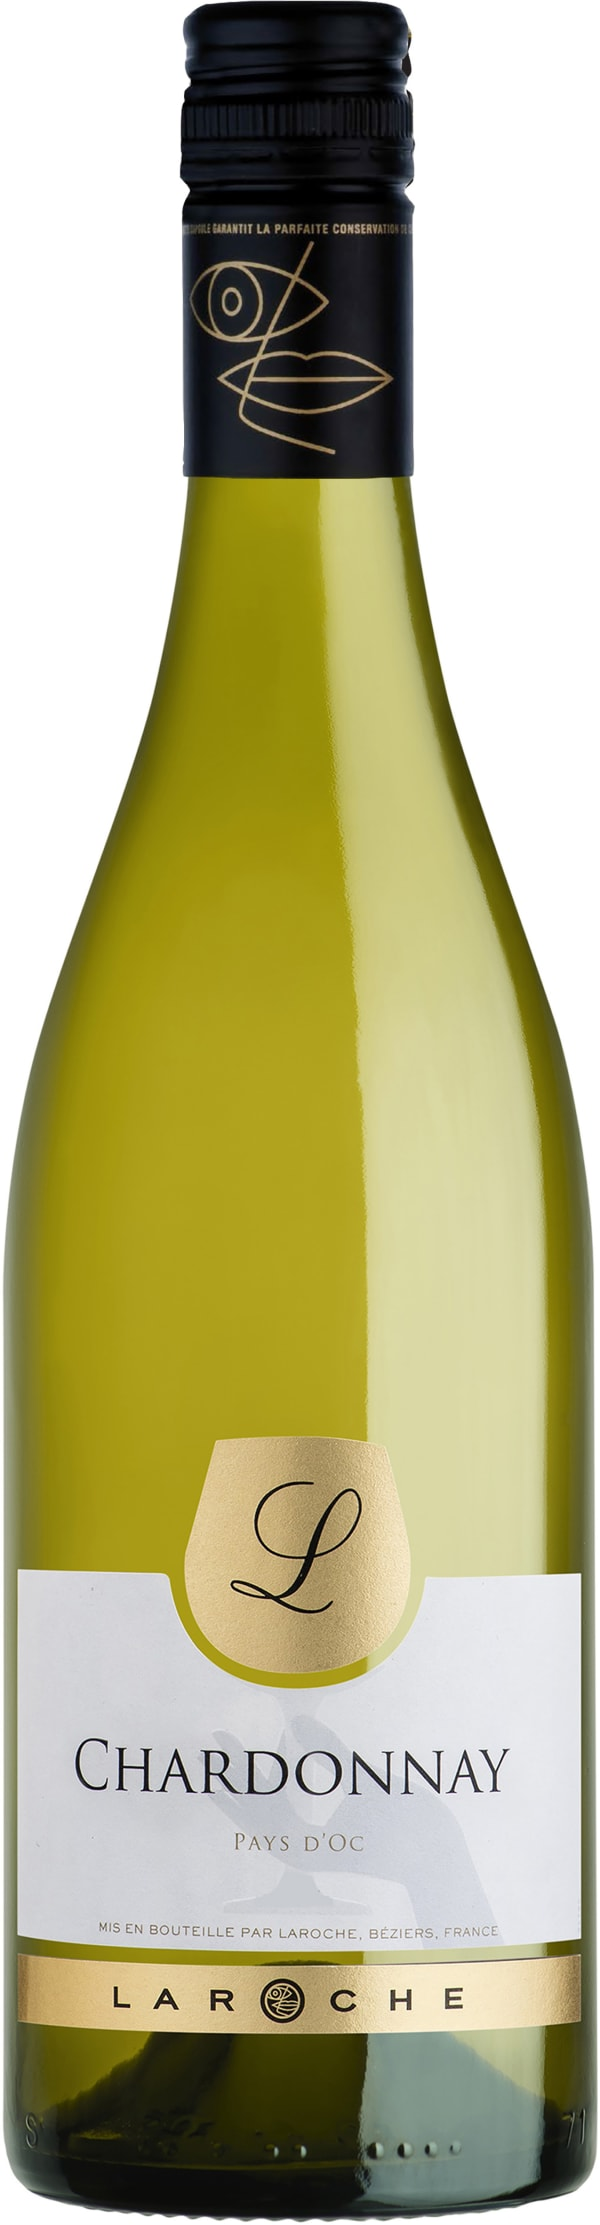 Laroche Chardonnay L 2018